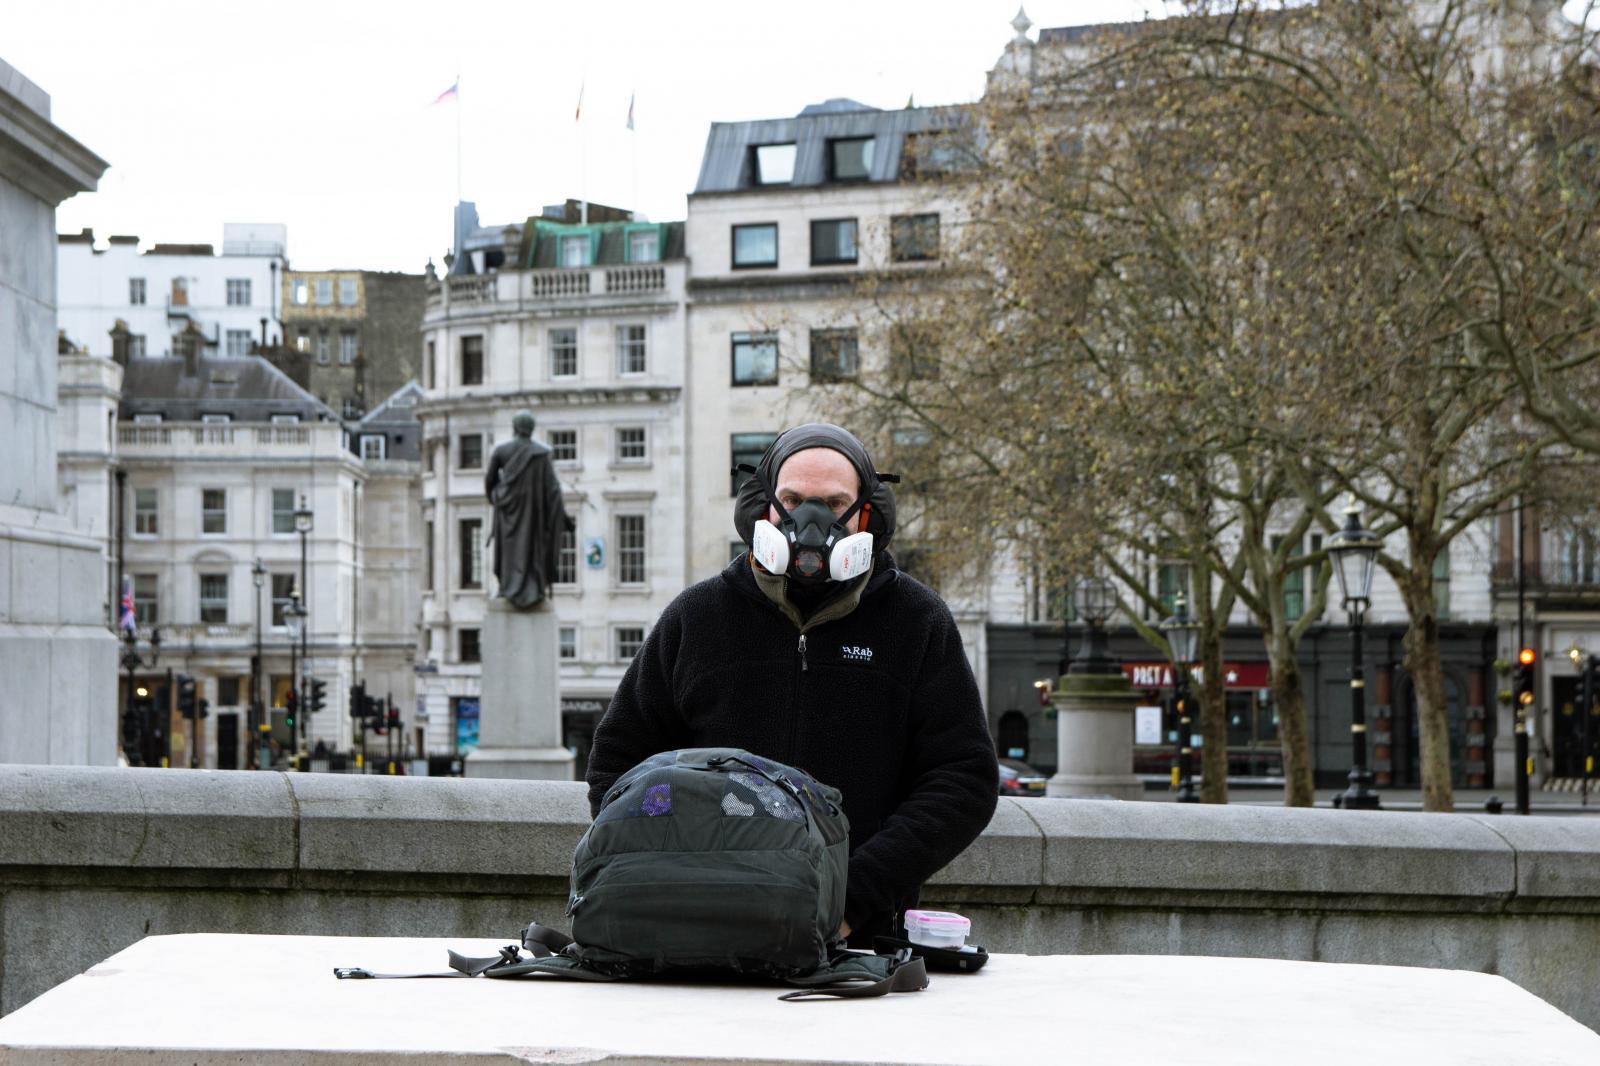 Photography image - Loading Homeless_(8_of_12).jpg